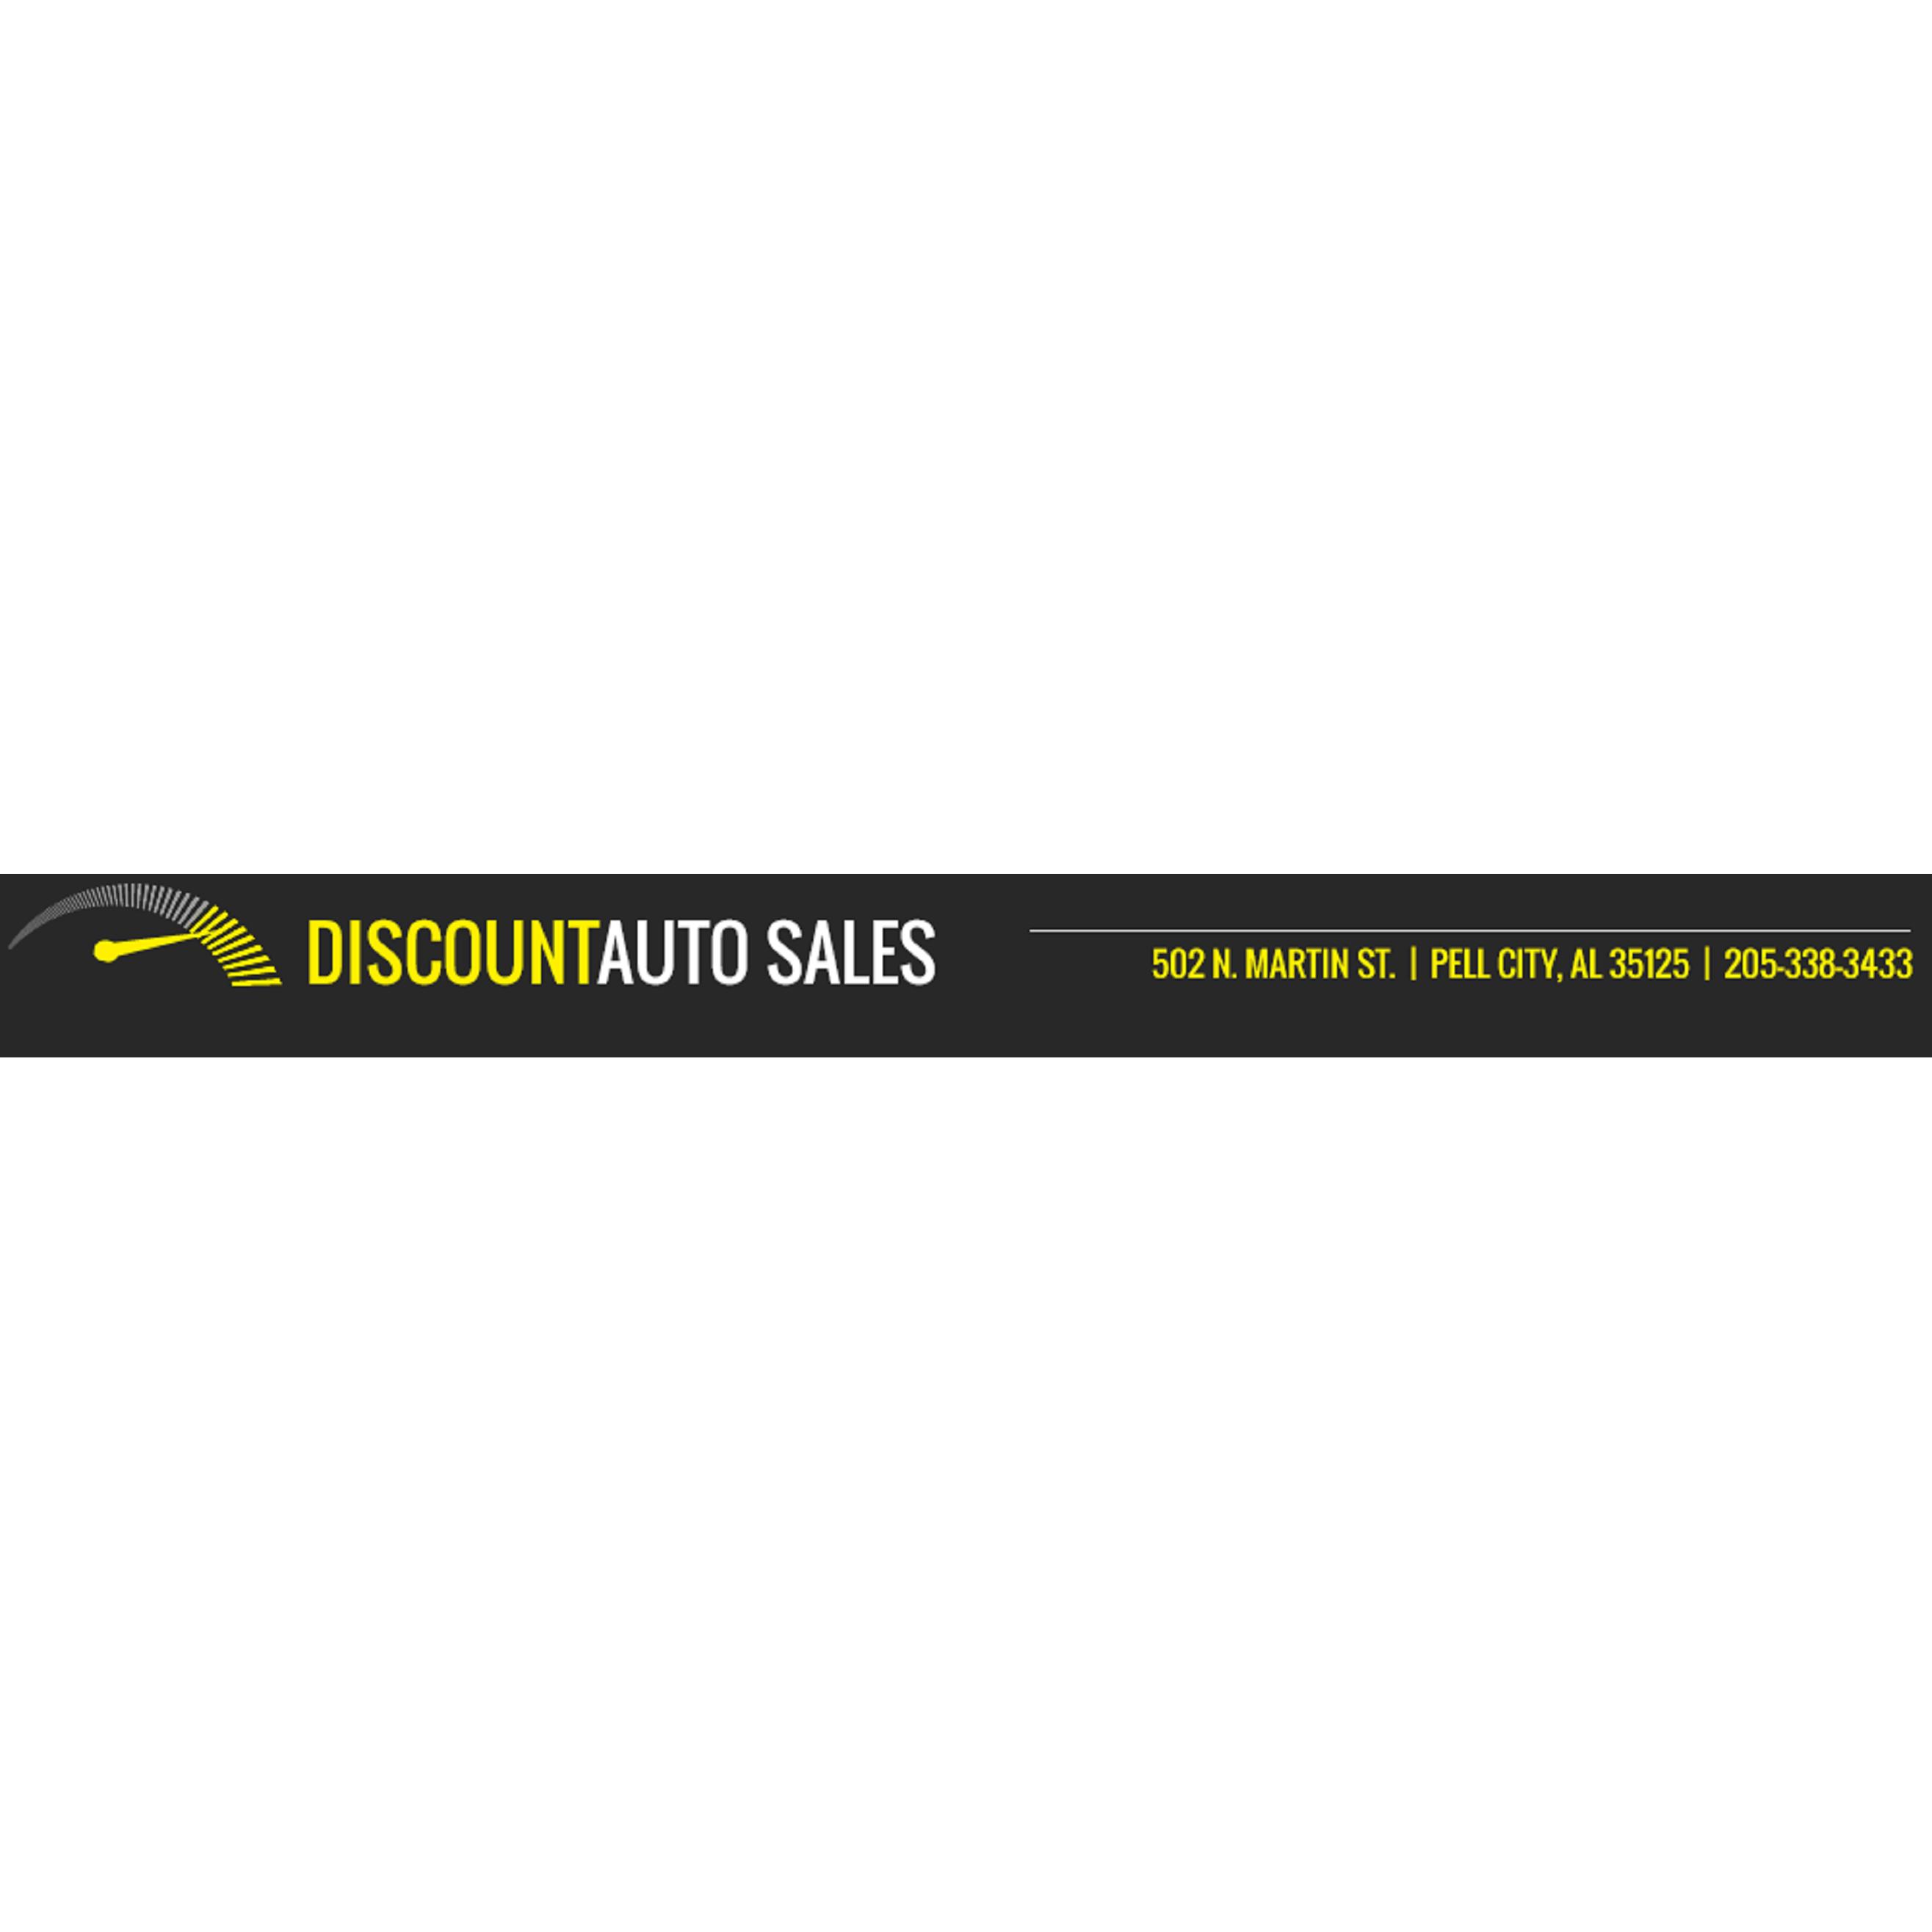 Discount Auto Sales